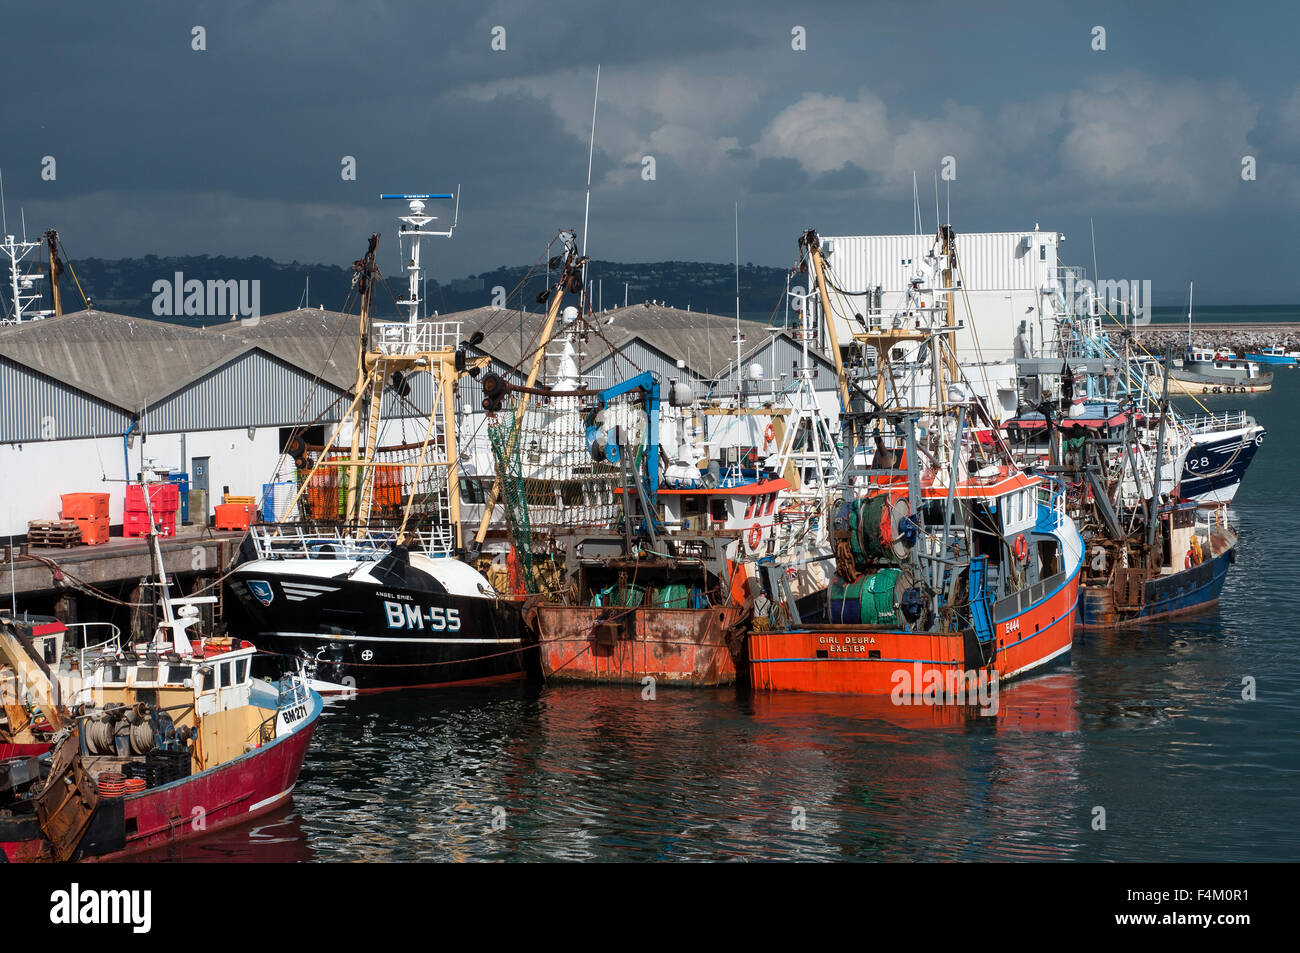 BM 55,boats, brixham, devon, fishing fleet, harbour, industry, quay, trawlers, vessels,trawler, brixham, machinery, - Stock Image